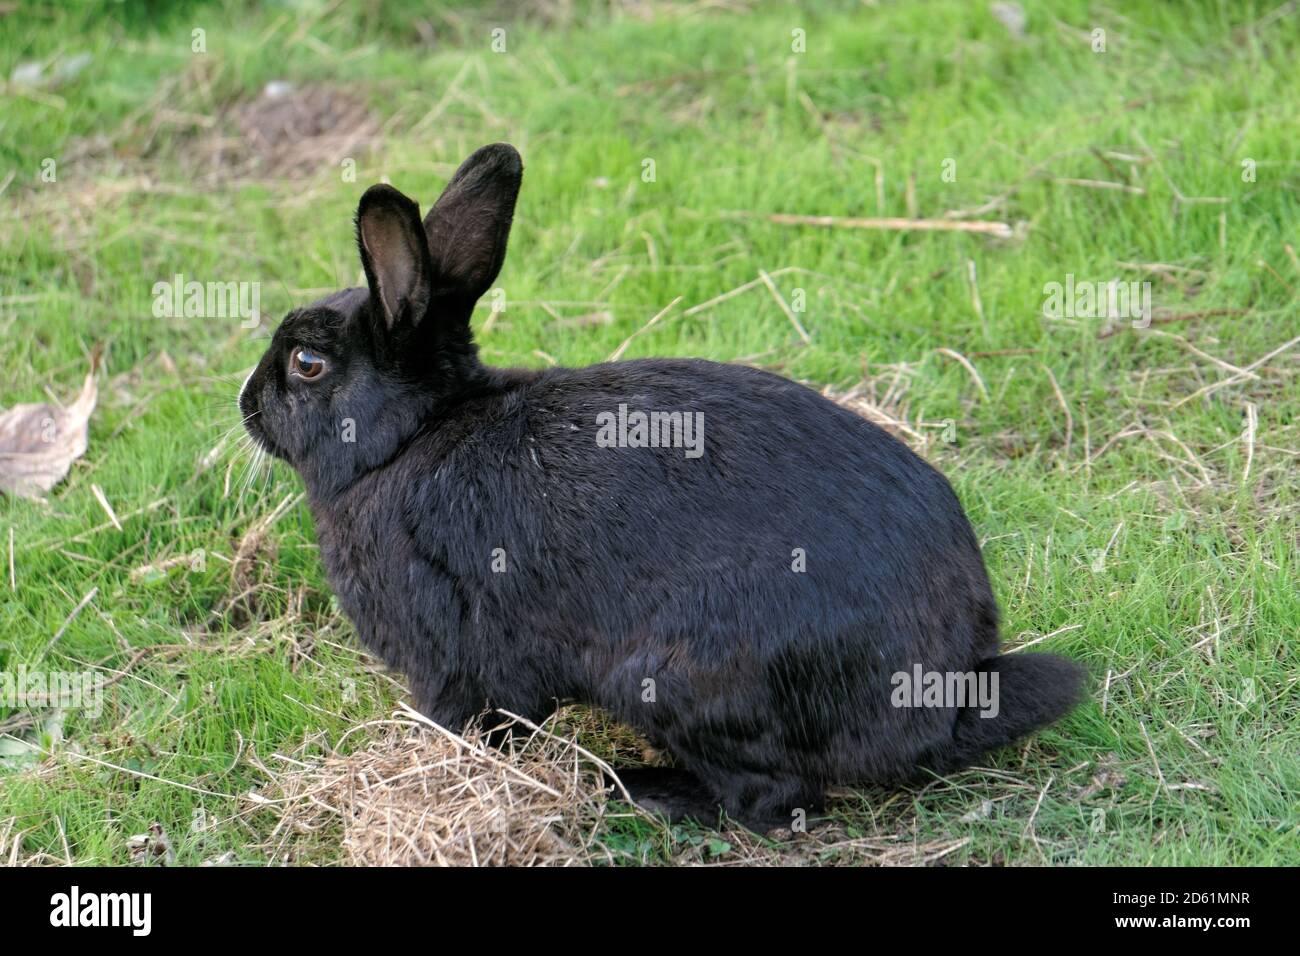 wild-black-rabbit-sitting-in-a-grassy-fi